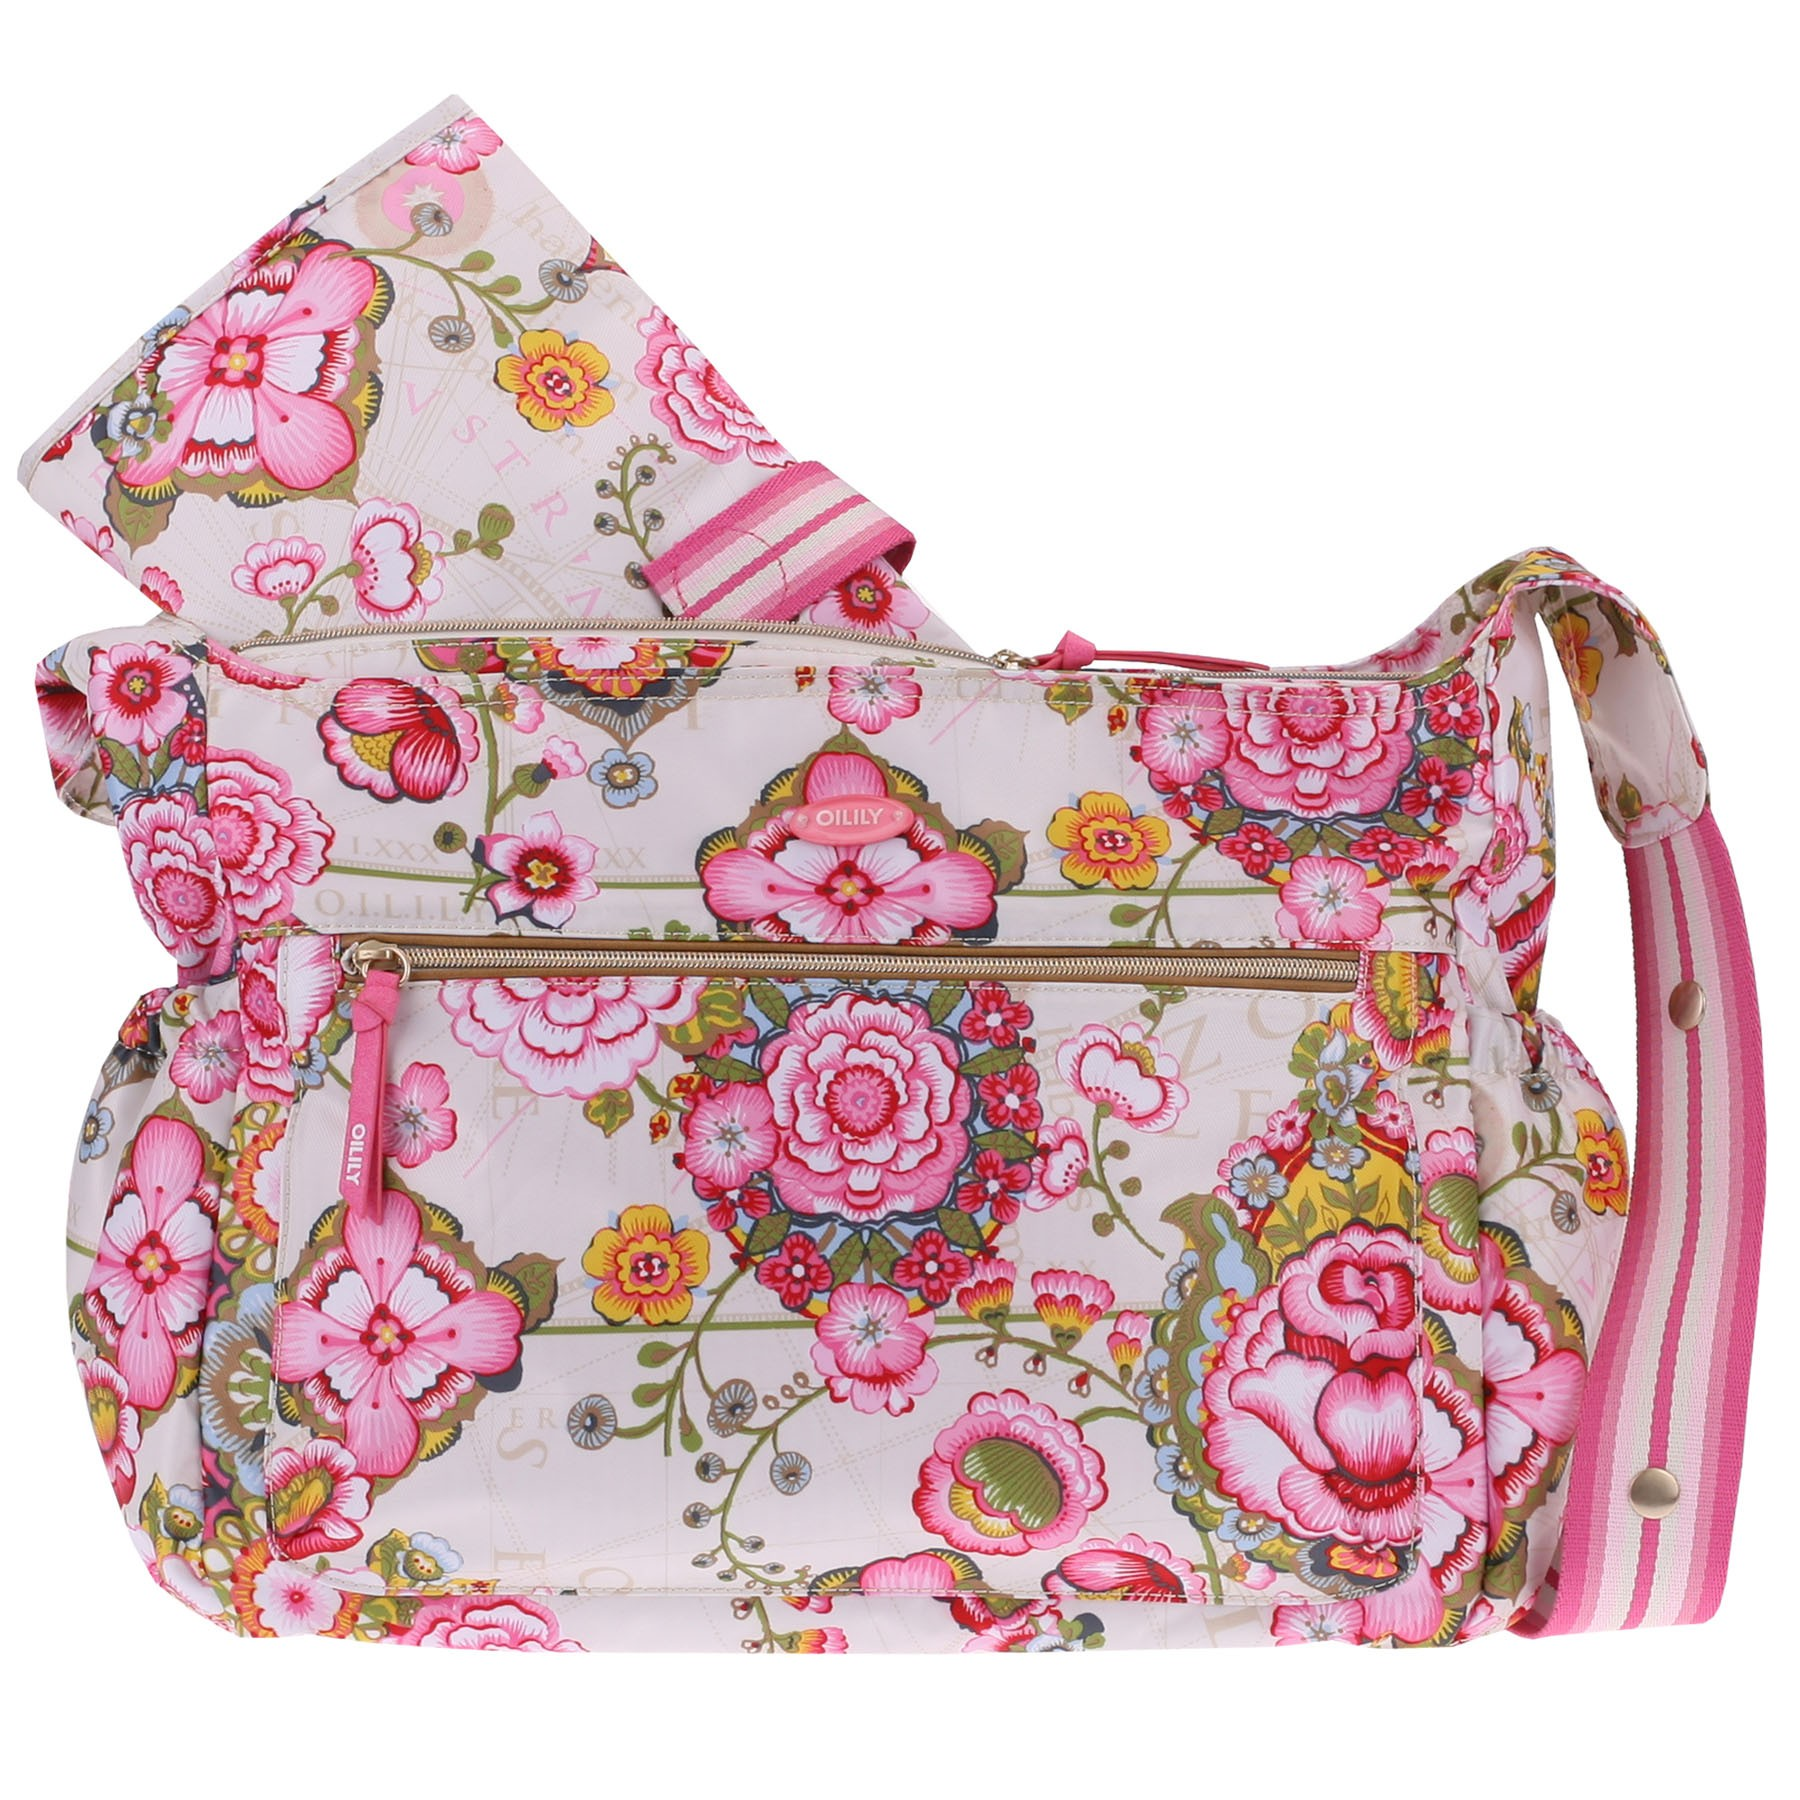 oilily wickeltasche baby bag fantasy flora cream ebay. Black Bedroom Furniture Sets. Home Design Ideas